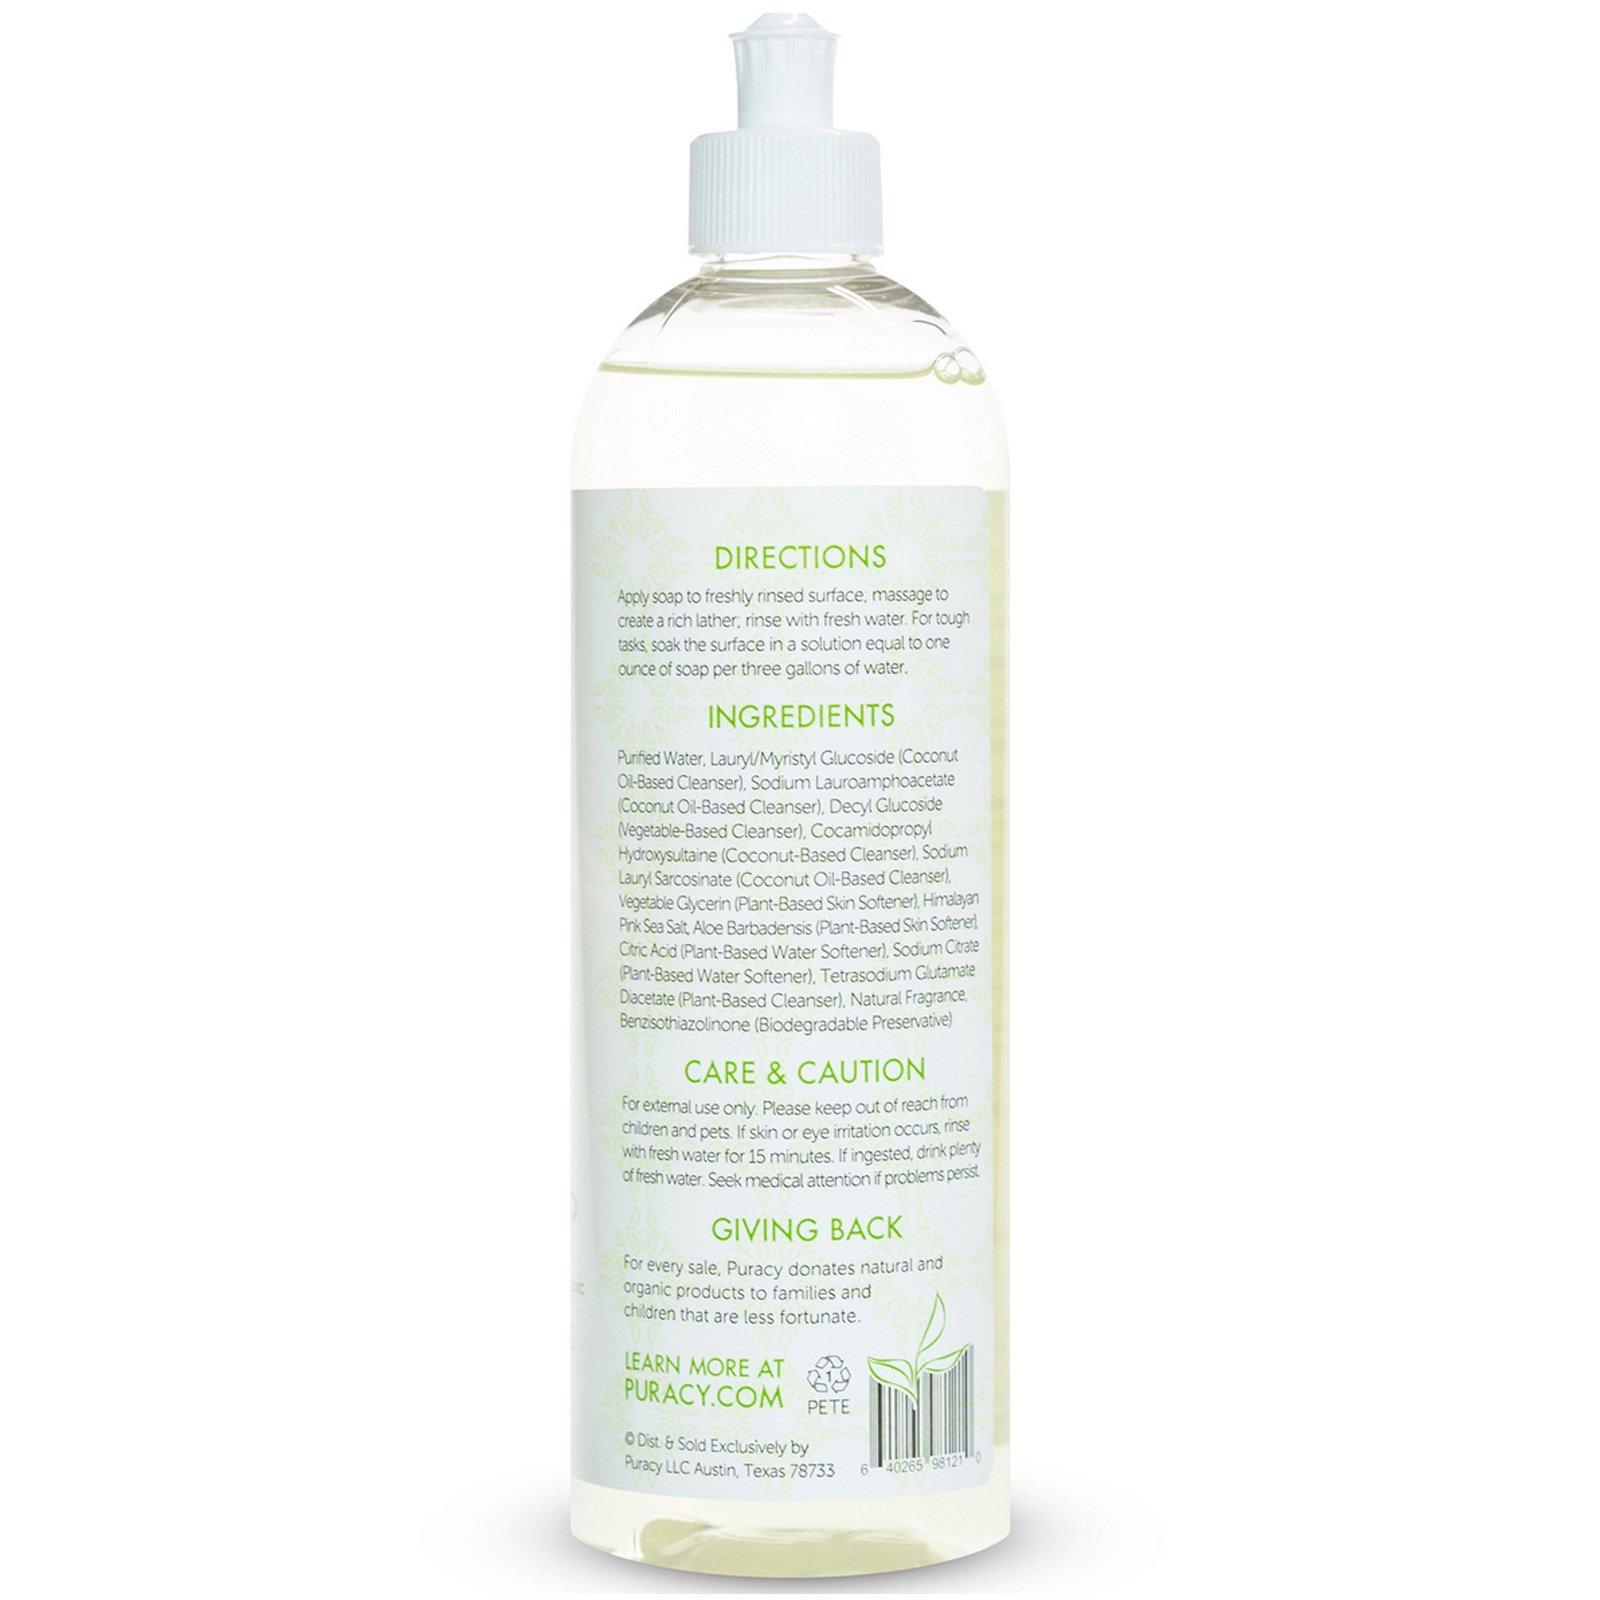 puracy liquide vaisselle naturel th vert et citron vert 16 fl oz 473 ml. Black Bedroom Furniture Sets. Home Design Ideas